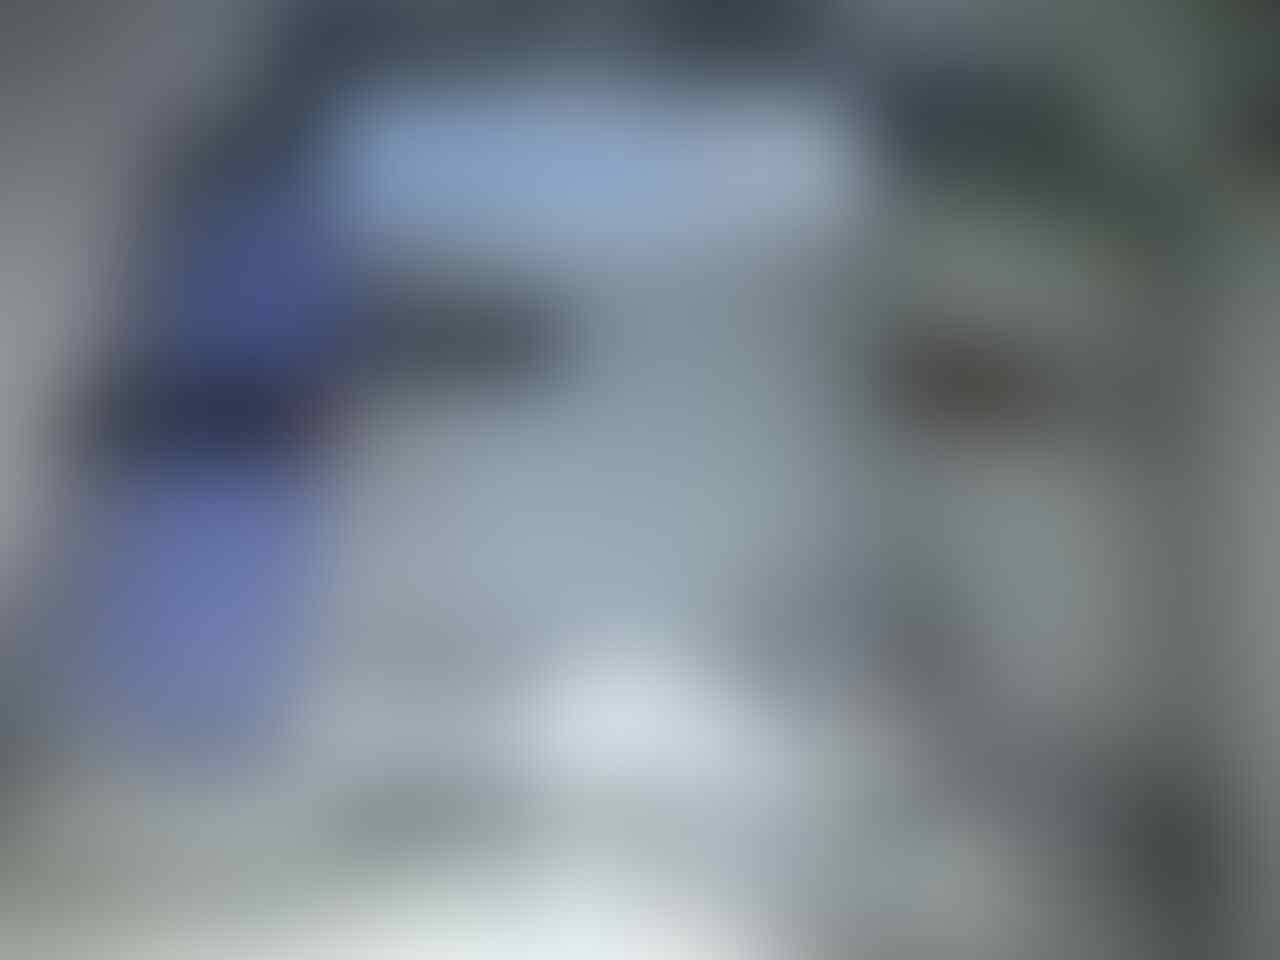 Original Case Capdase Softjacket HTC One X/V/Desire VC/Karapace Finne/Sider Polka